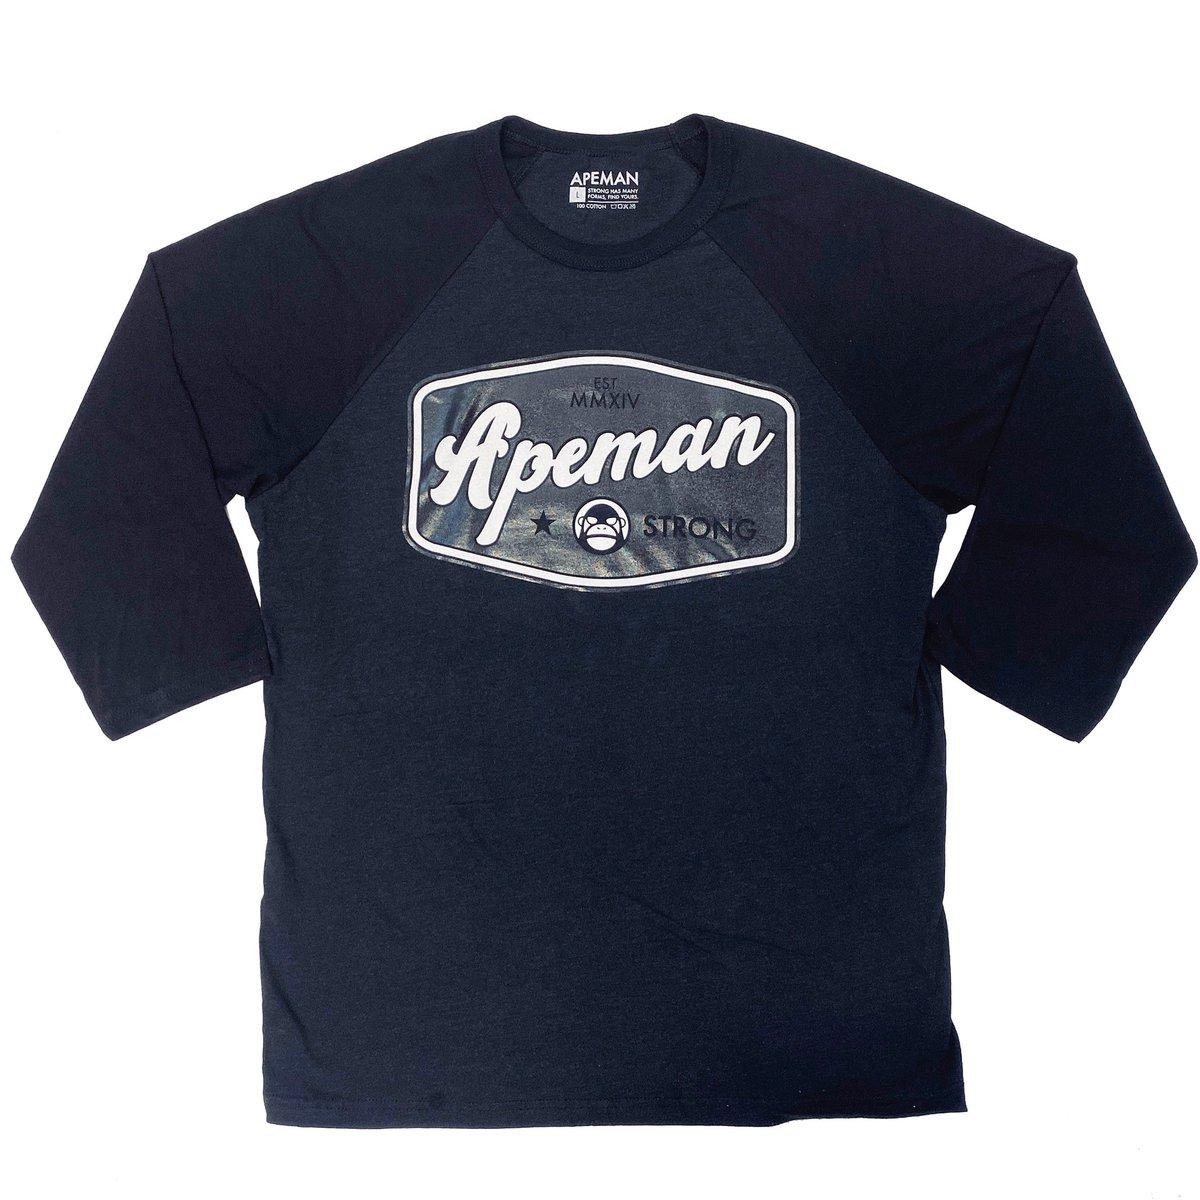 New Baseball Tee. Black and charcoal, black and white print. apemanstrong.com/hoodies/est-ba…